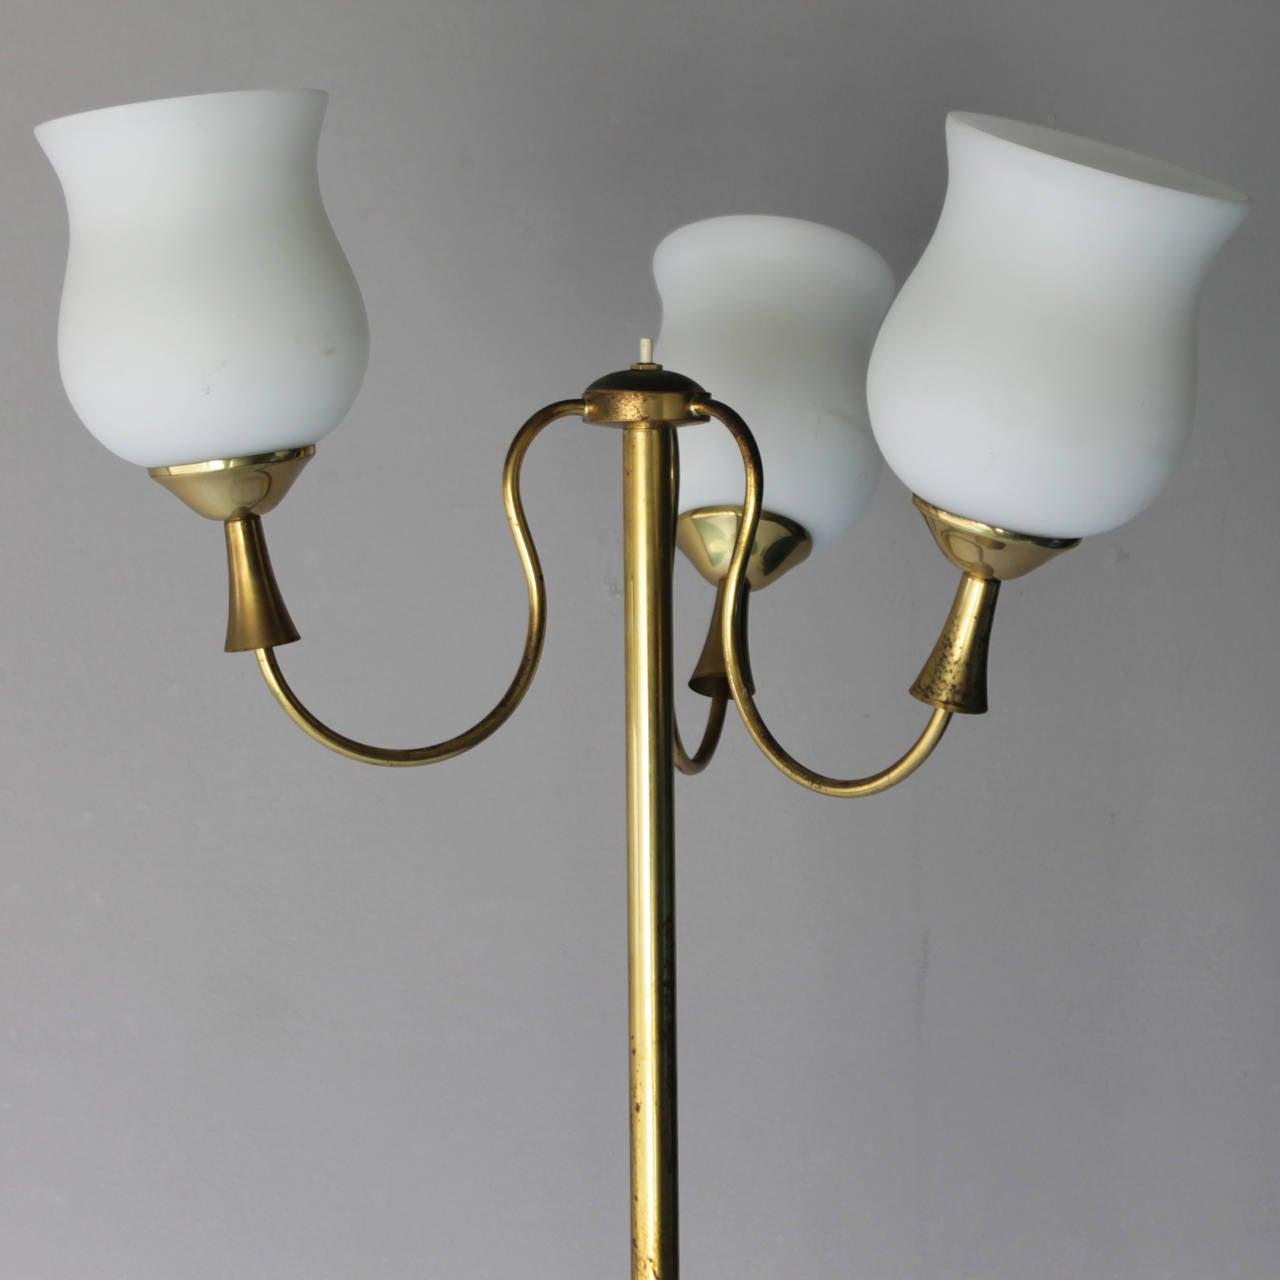 Elegant Italian Floor Lamp by Arredoluce In Good Condition For Sale In JM Haarlem, NL